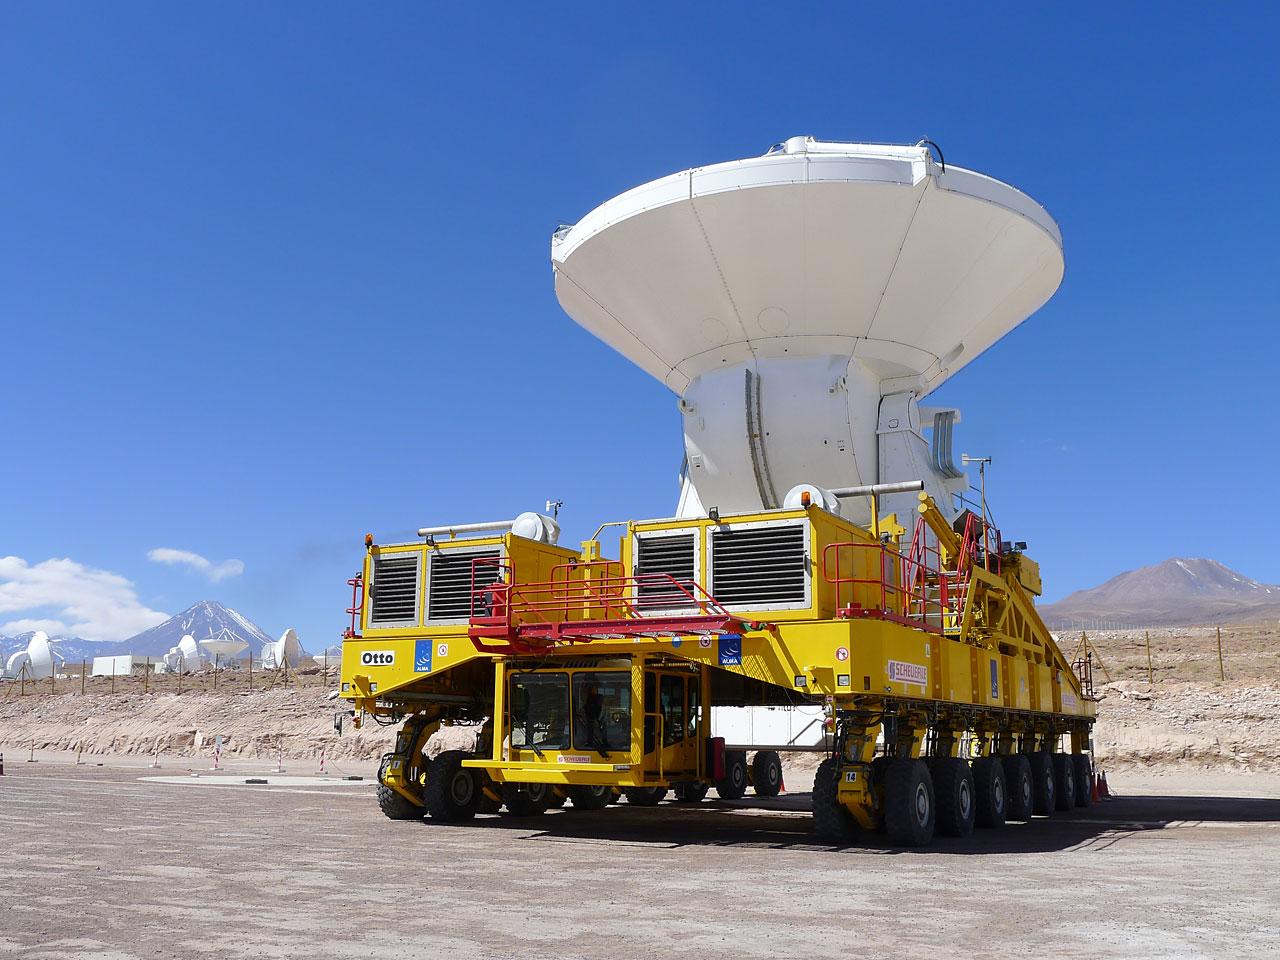 Giant Radio Telescope Reaches Full Power with 66 Antennas